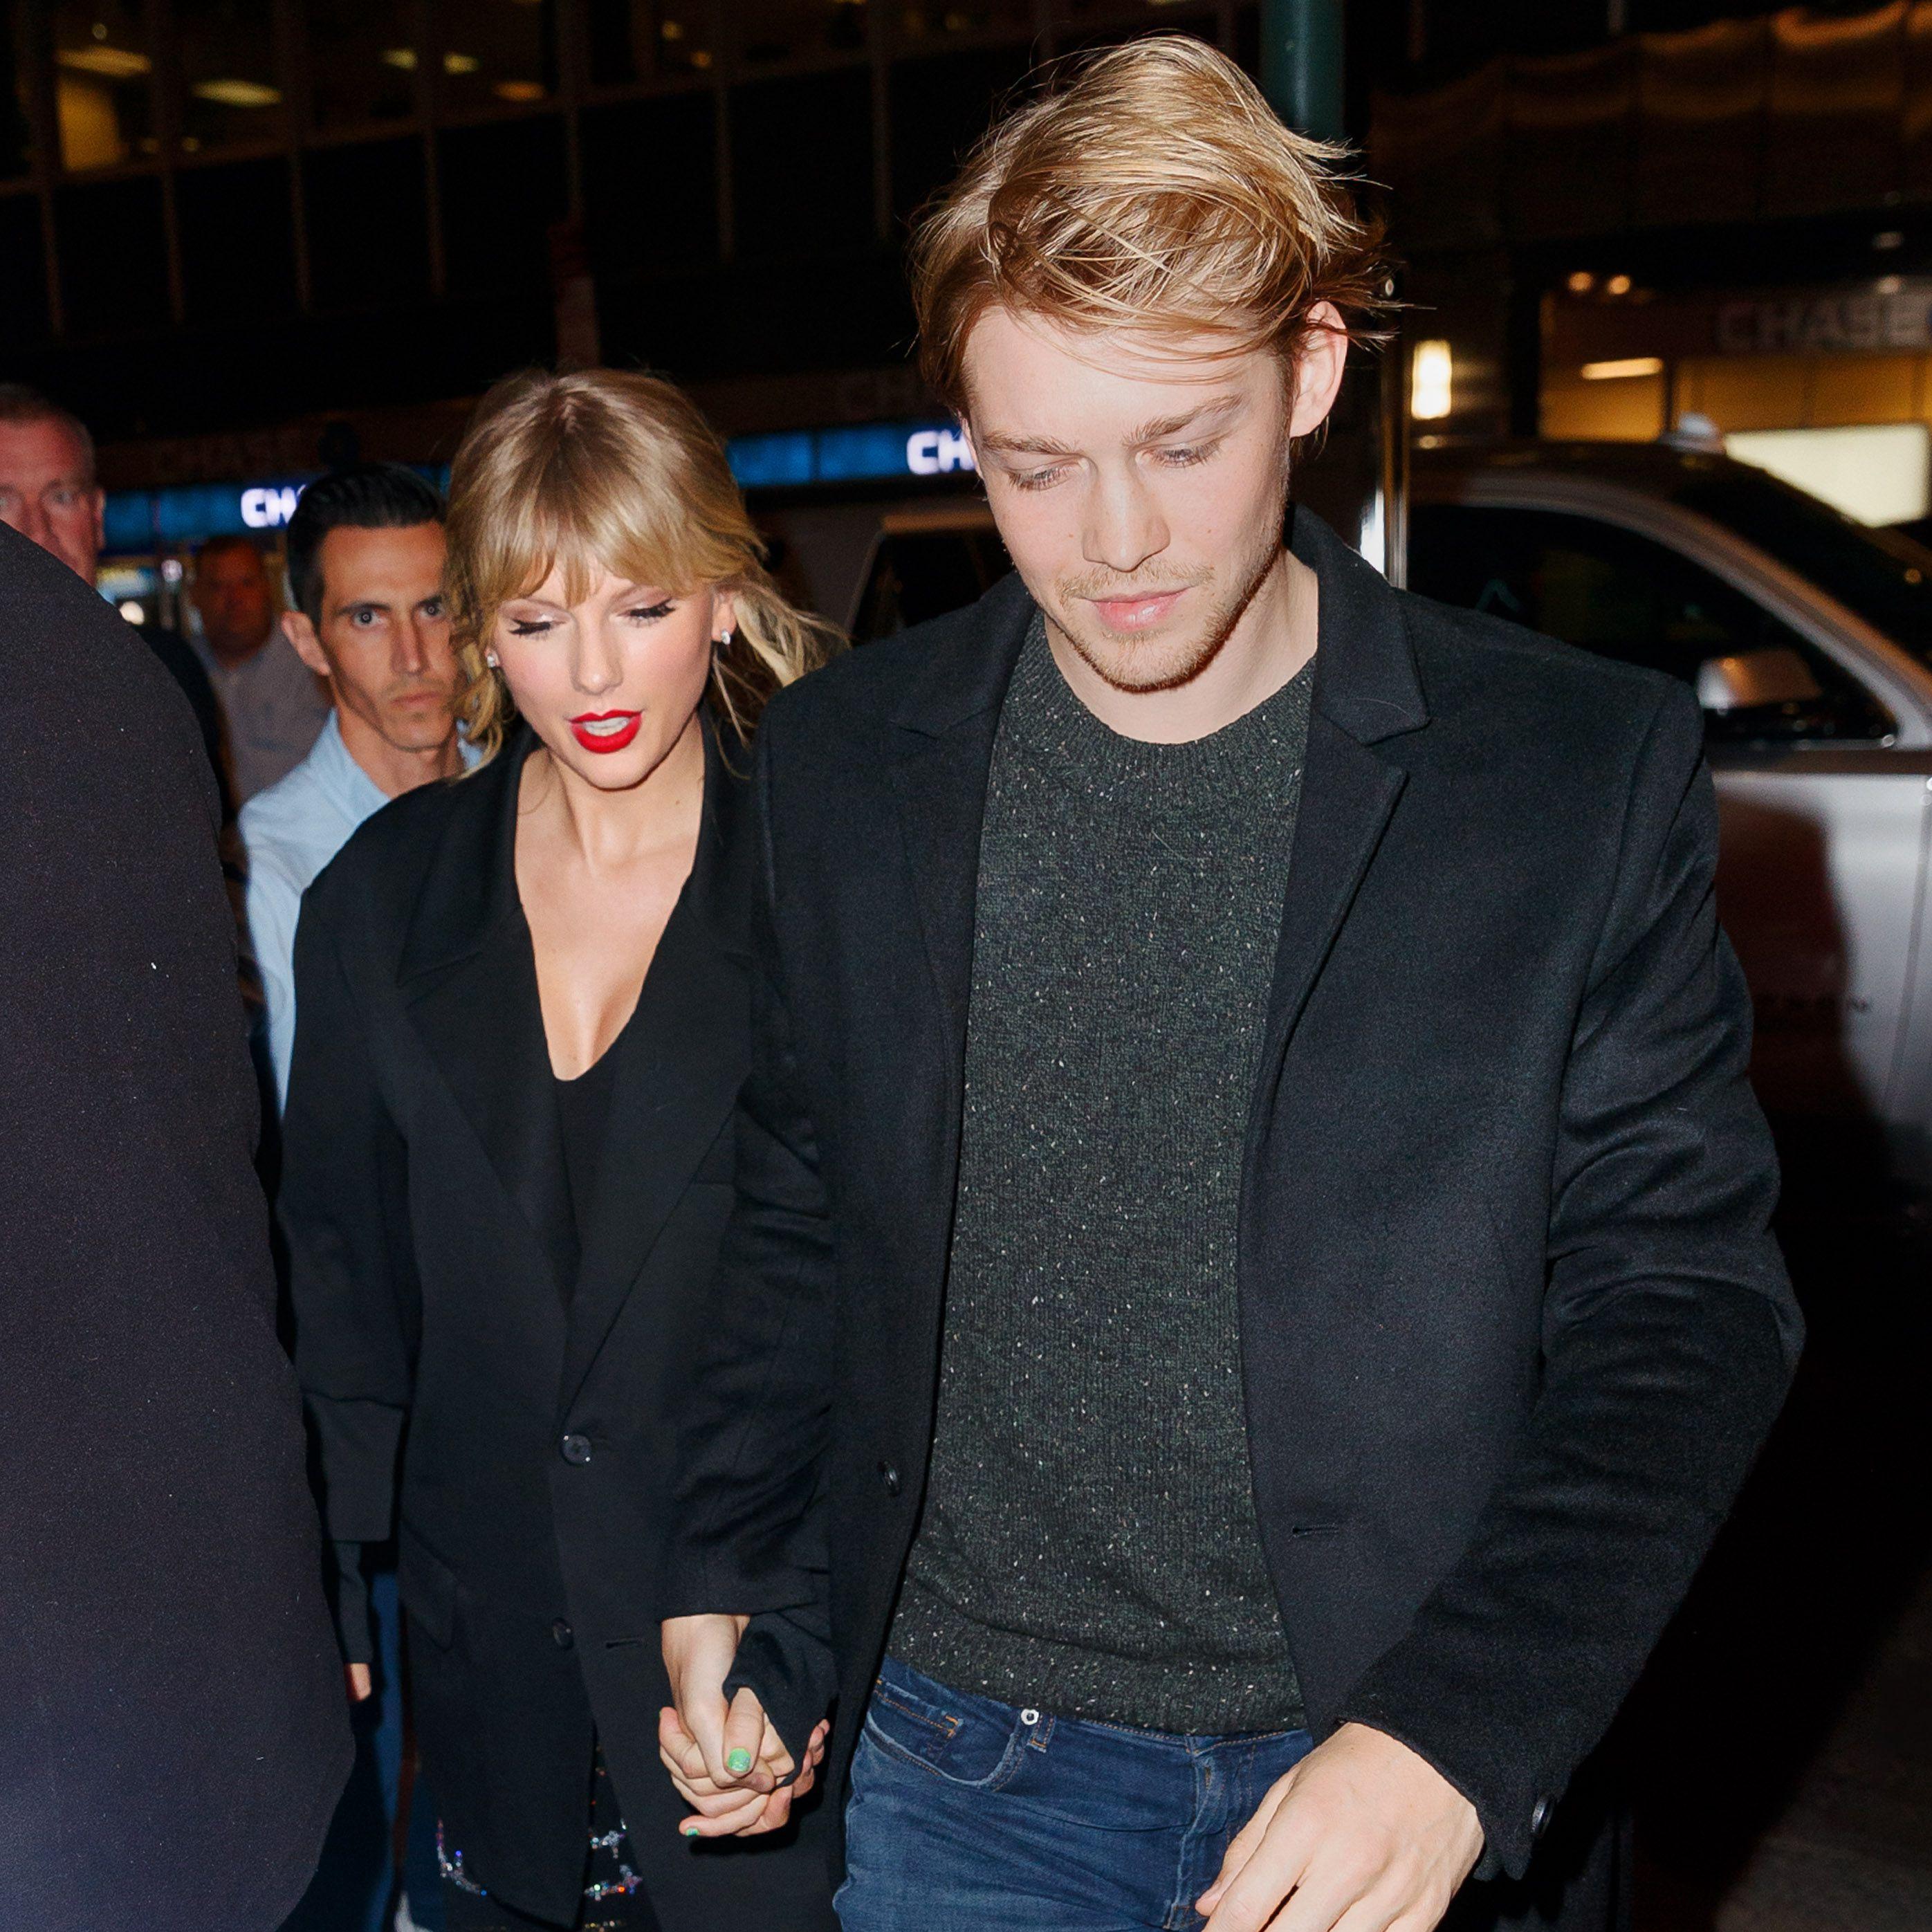 Taylor swift and joe alwyn together